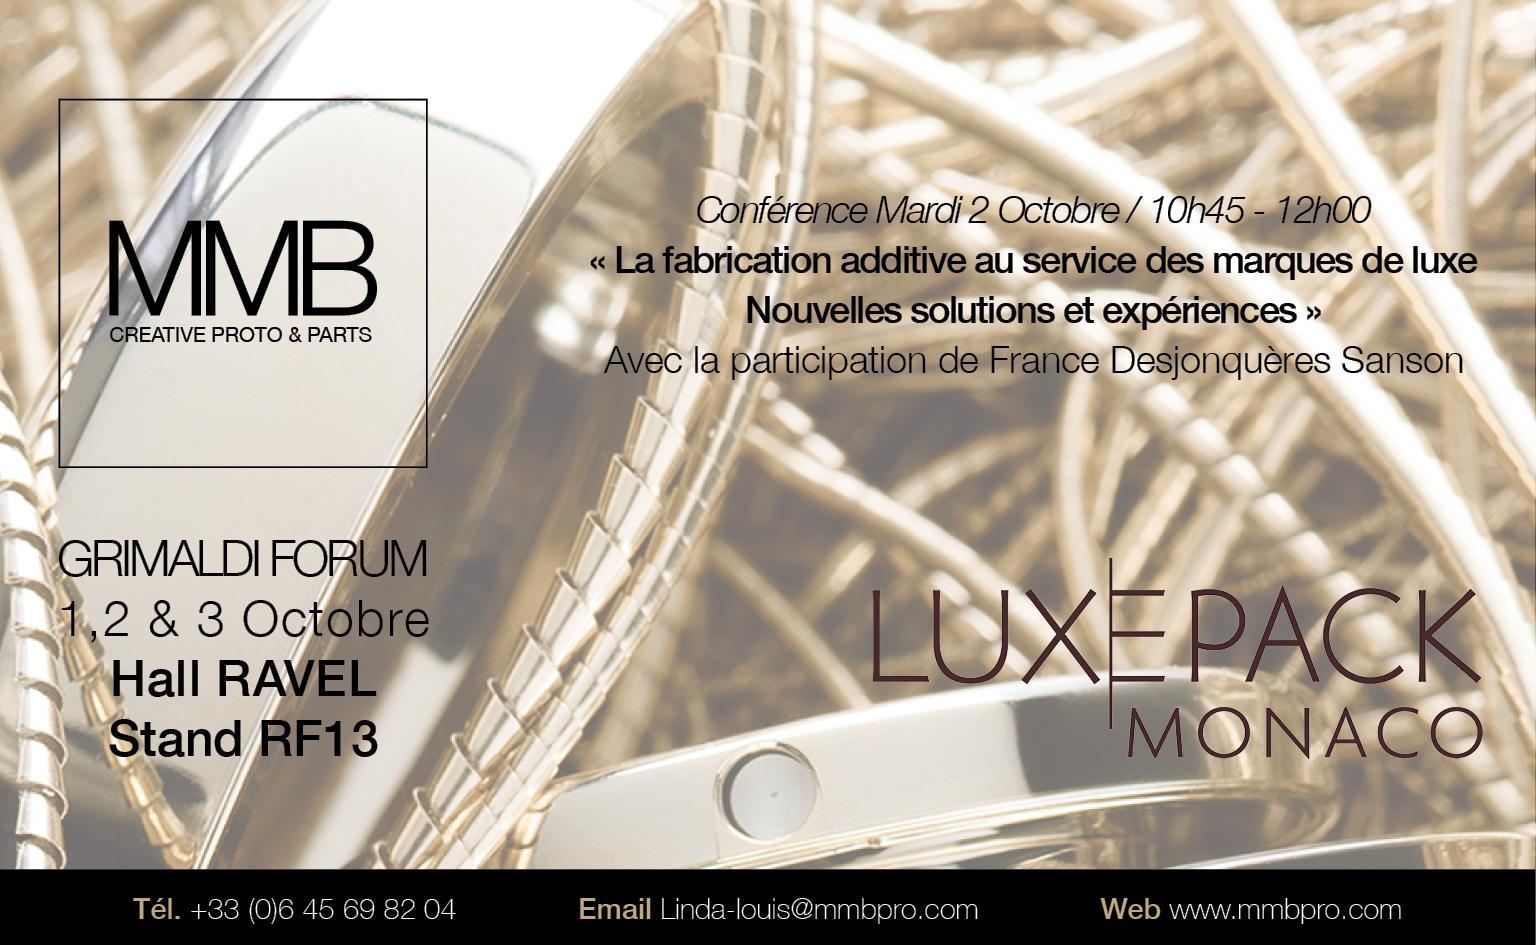 Presence Luxepack Monaco 2018 MMB